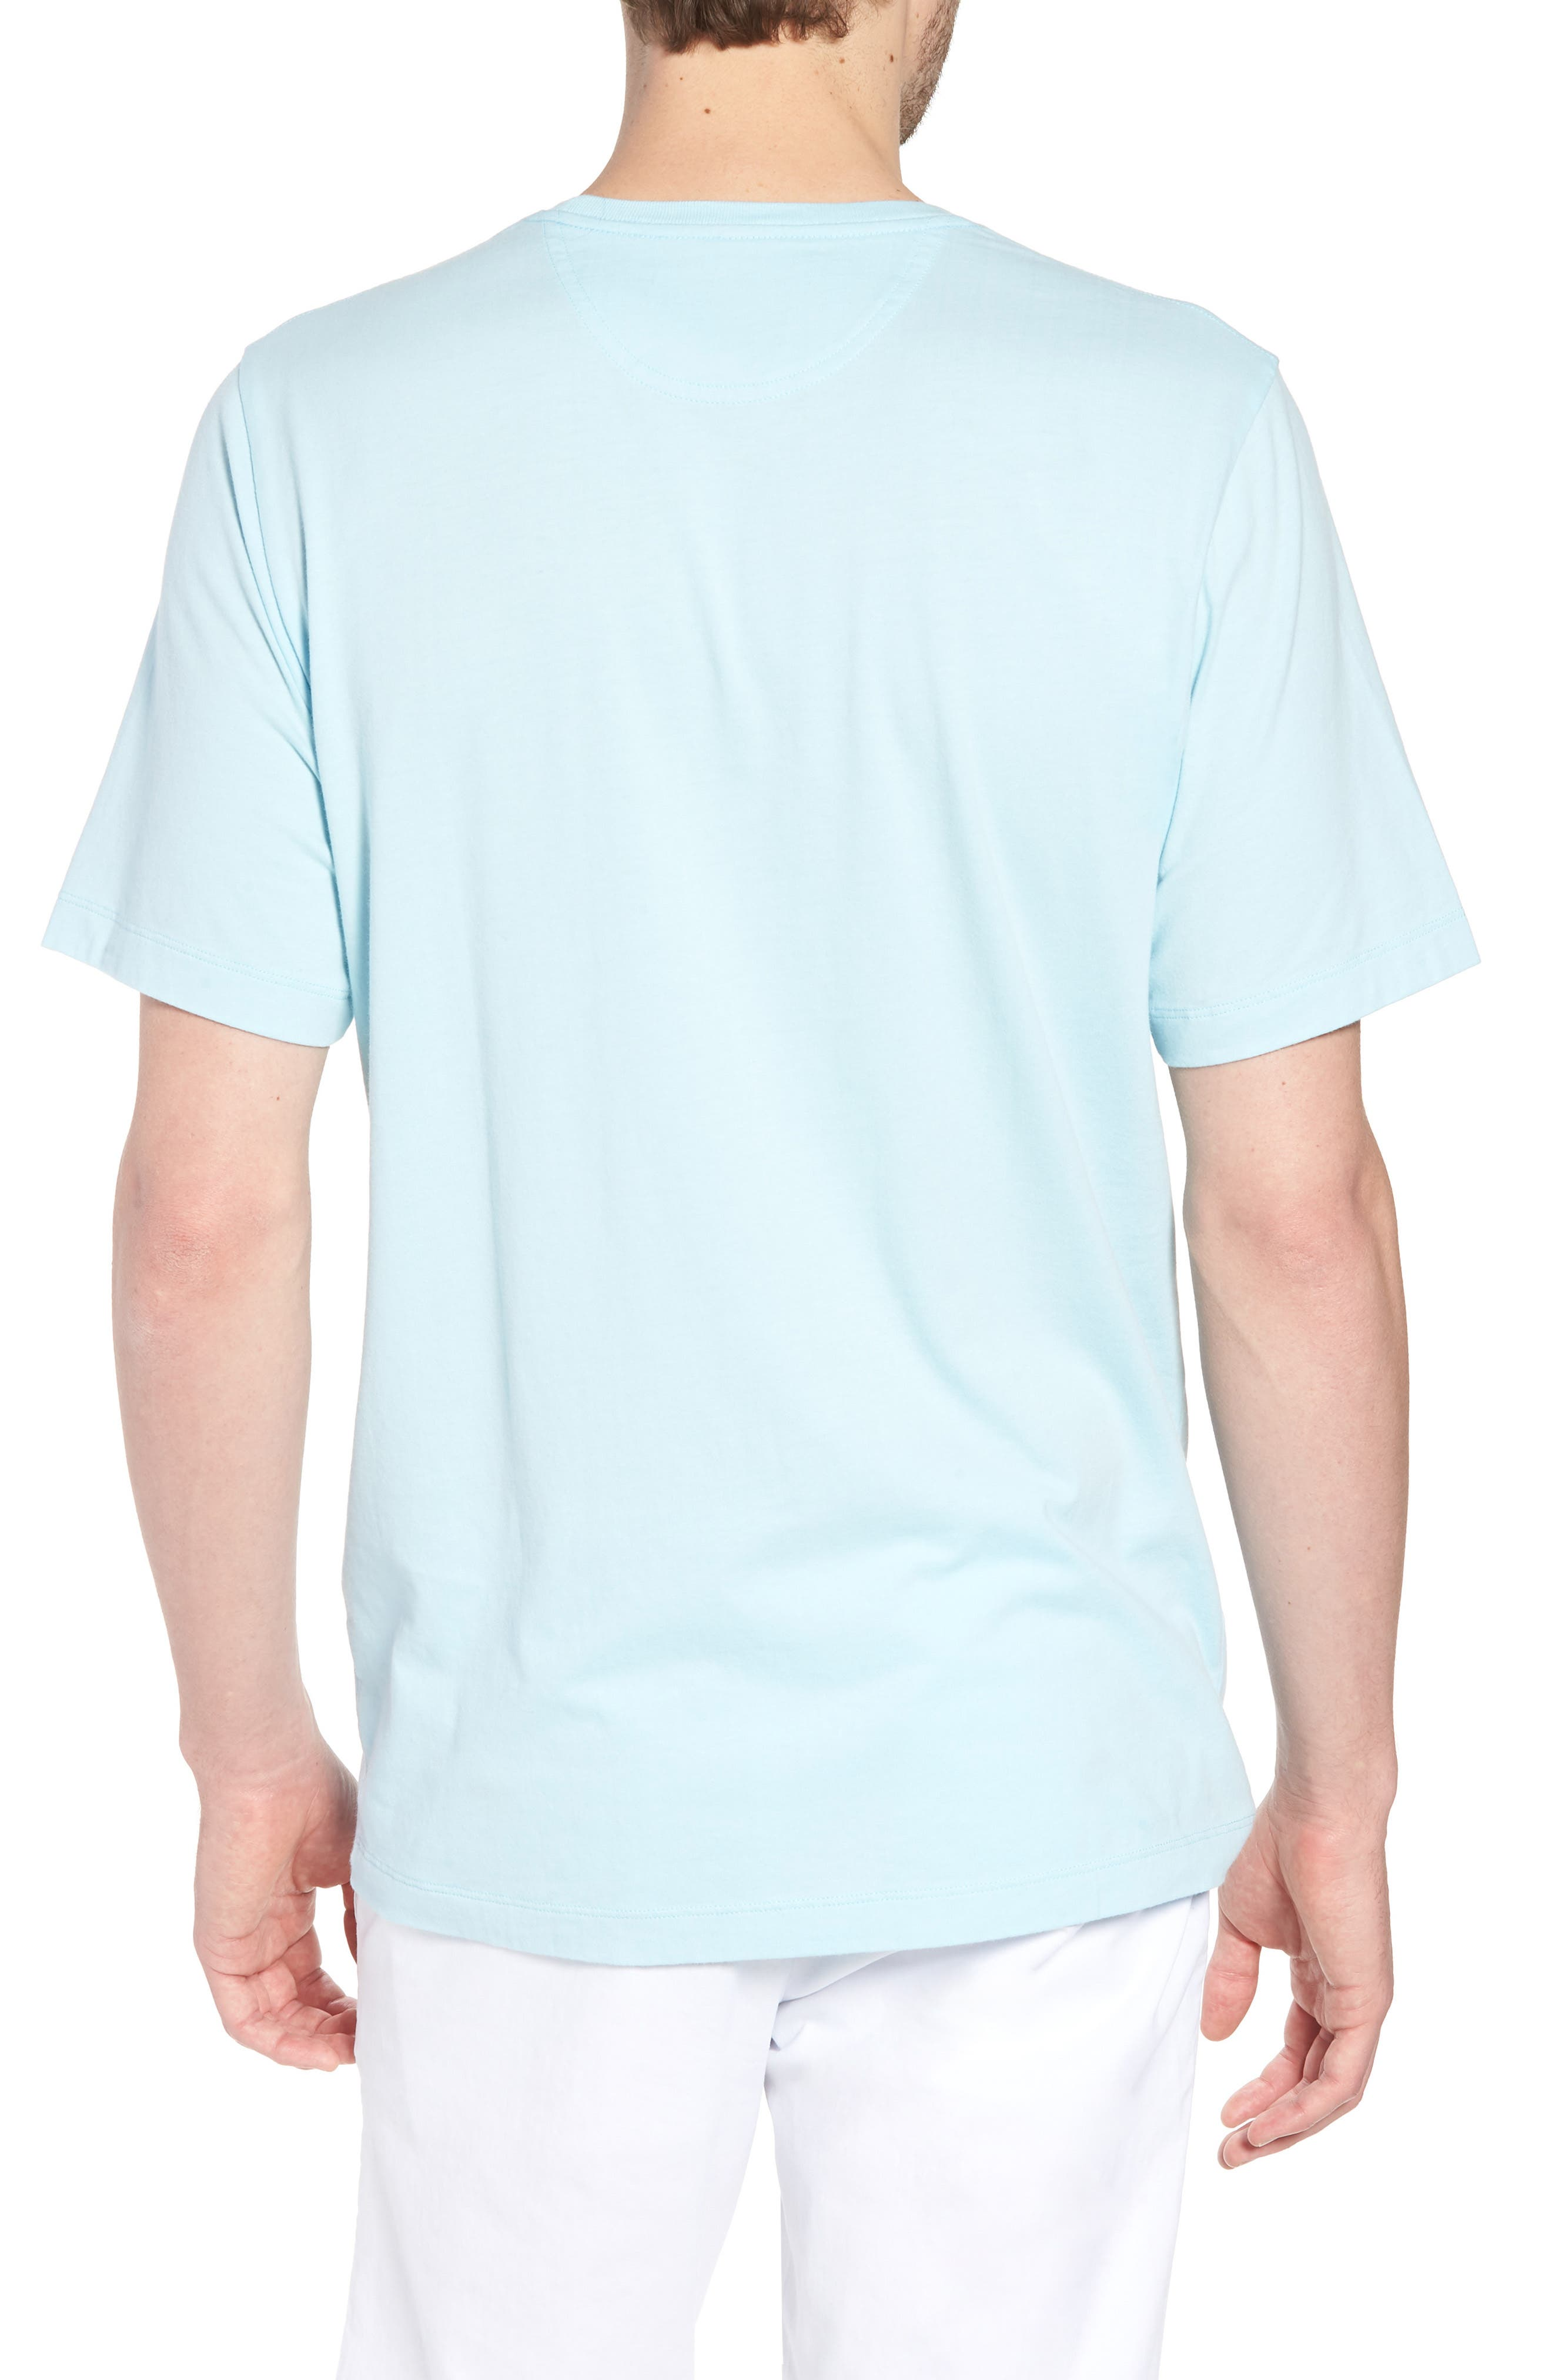 Brushed Pima Cotton T-Shirt,                             Alternate thumbnail 2, color,                             Blue Orydalis